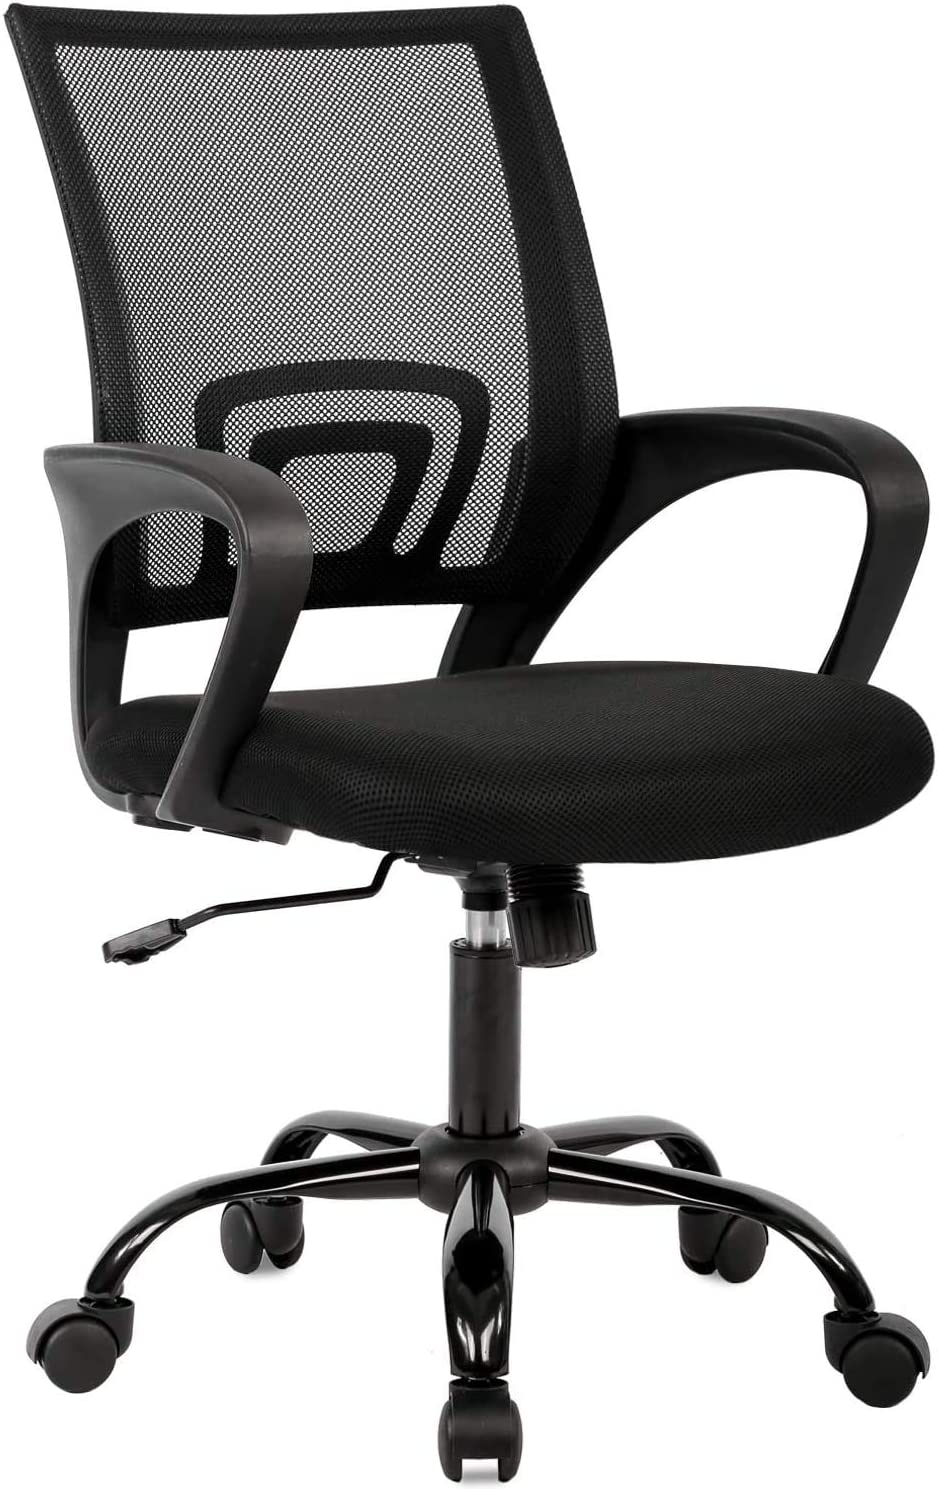 Payhere Ergonomic Office Chair Computer Desk Chair